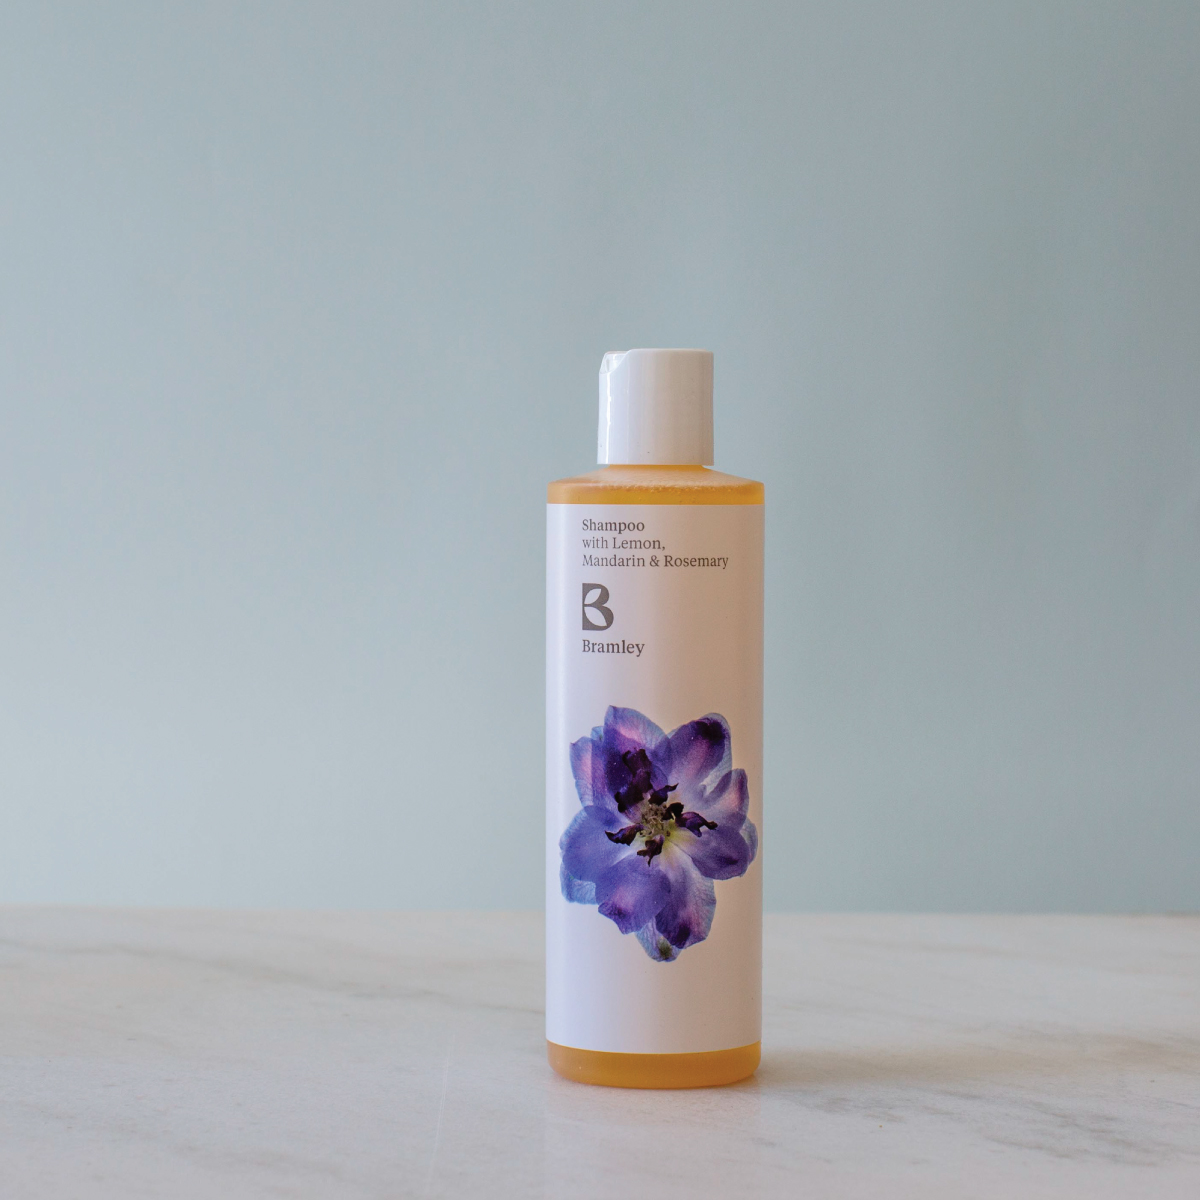 Bramley-Shampoo